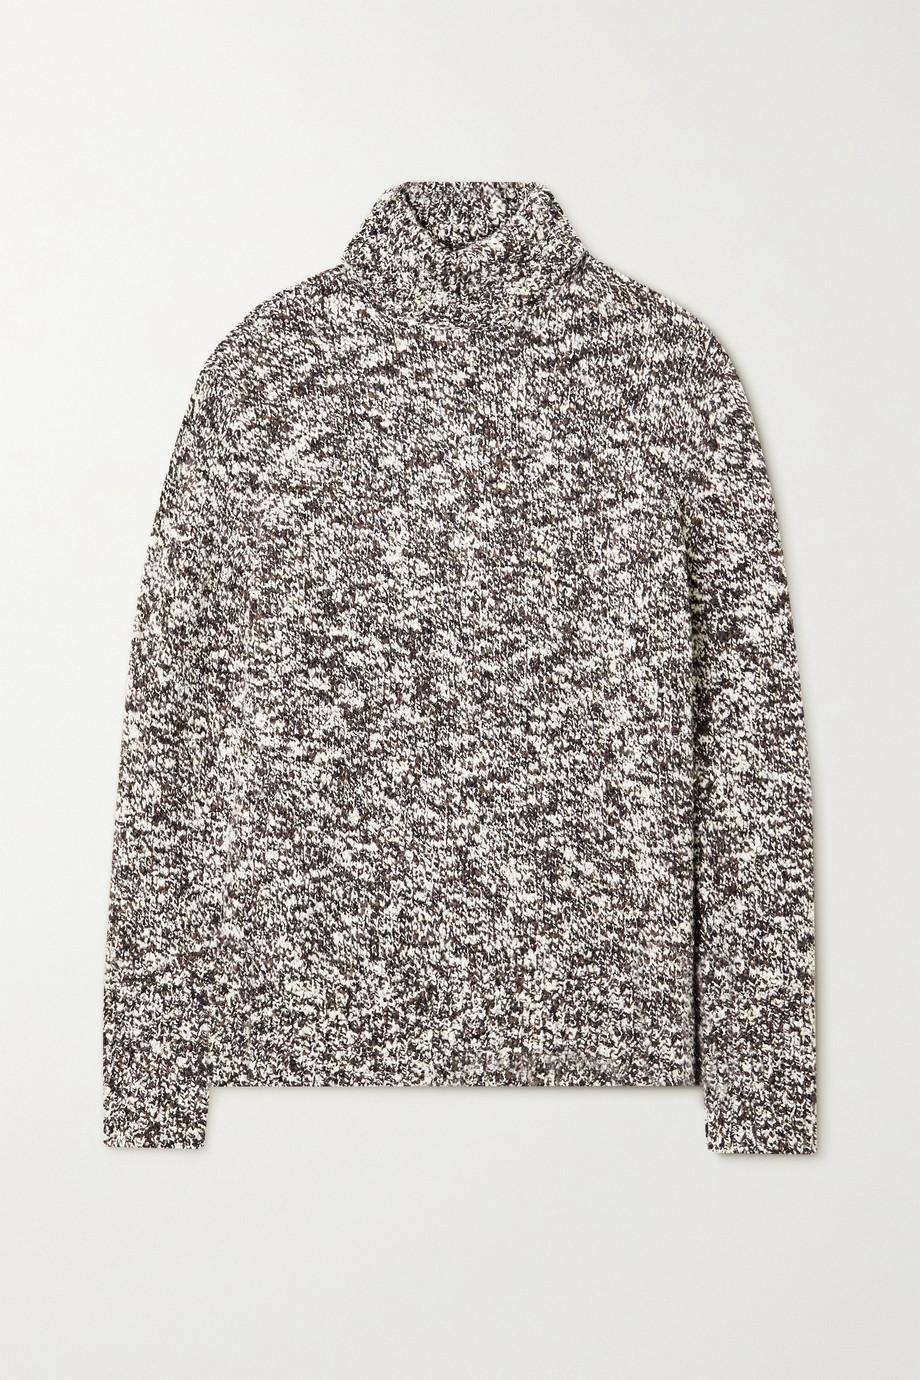 Joseph Merino wool-blend bouclé turtleneck sweater